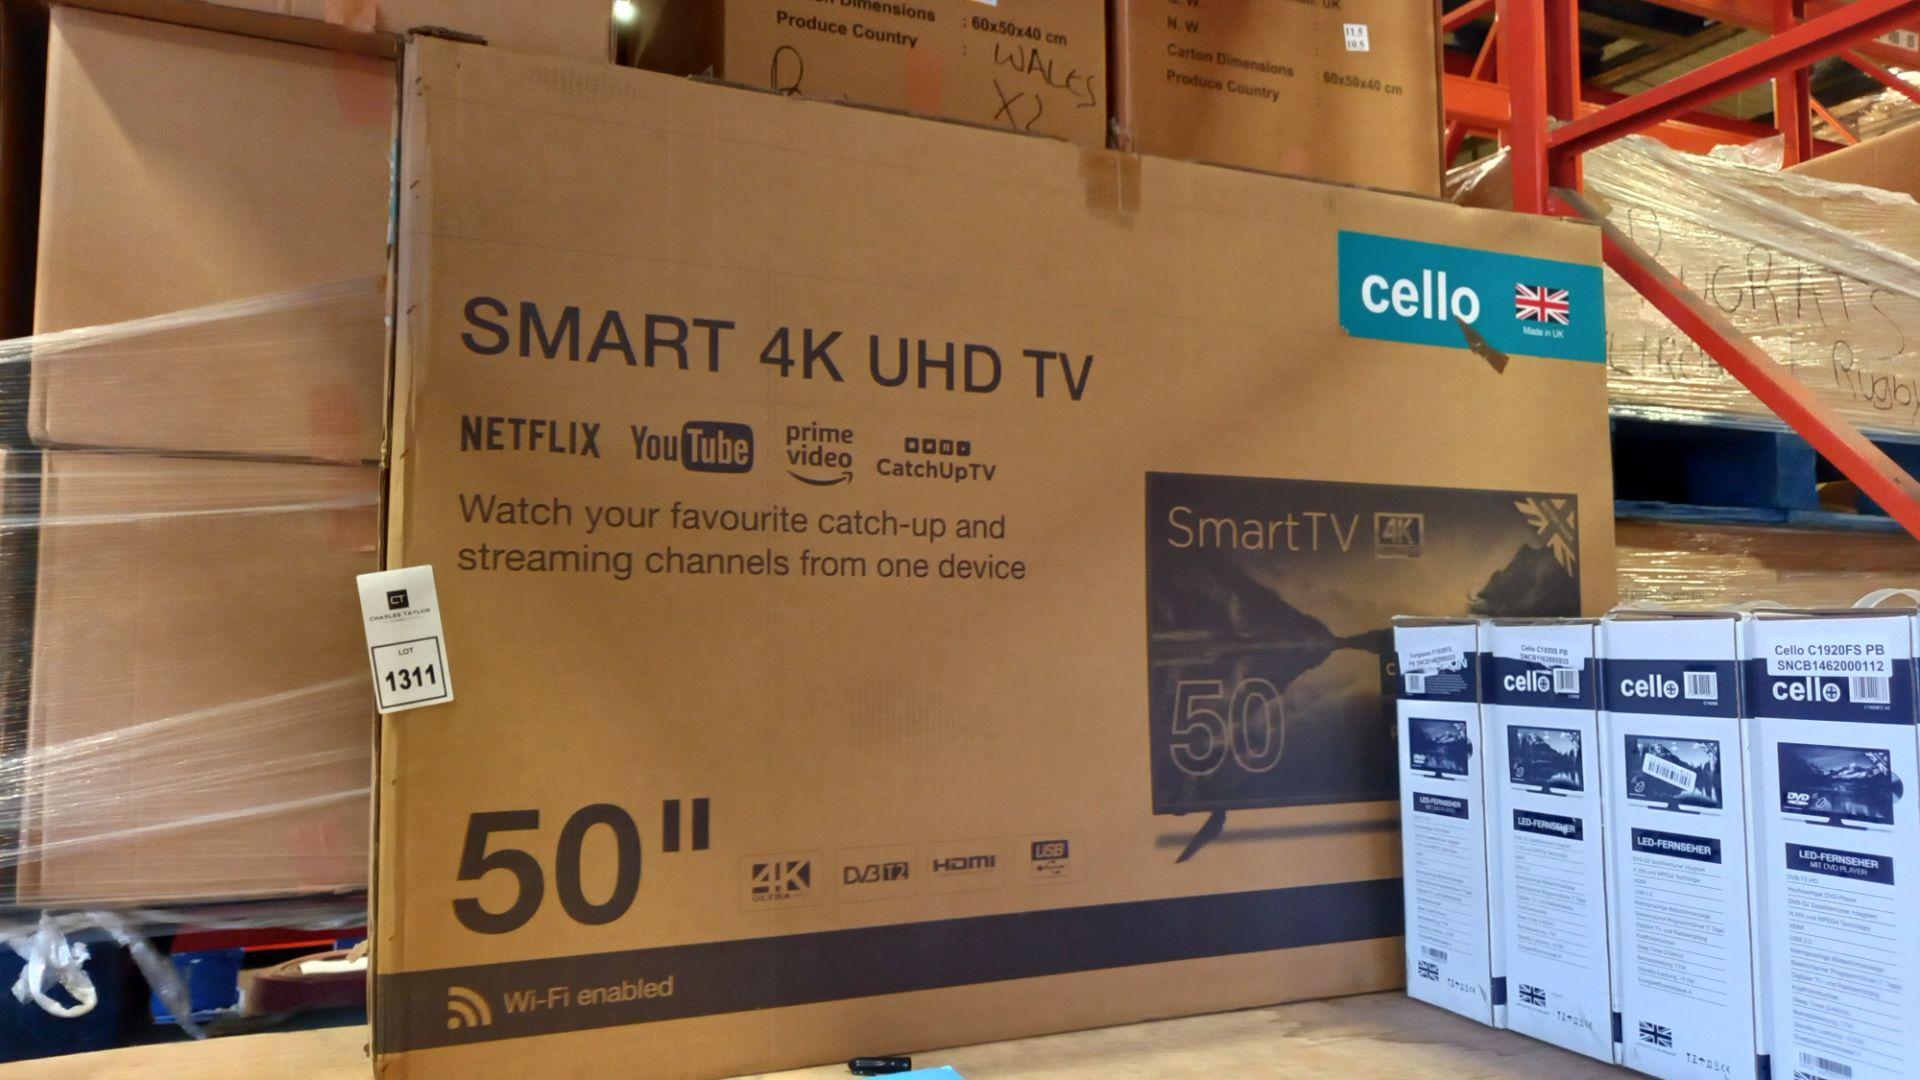 1 X BRAND NEW CELLO SMART 4K UHD 50 TV